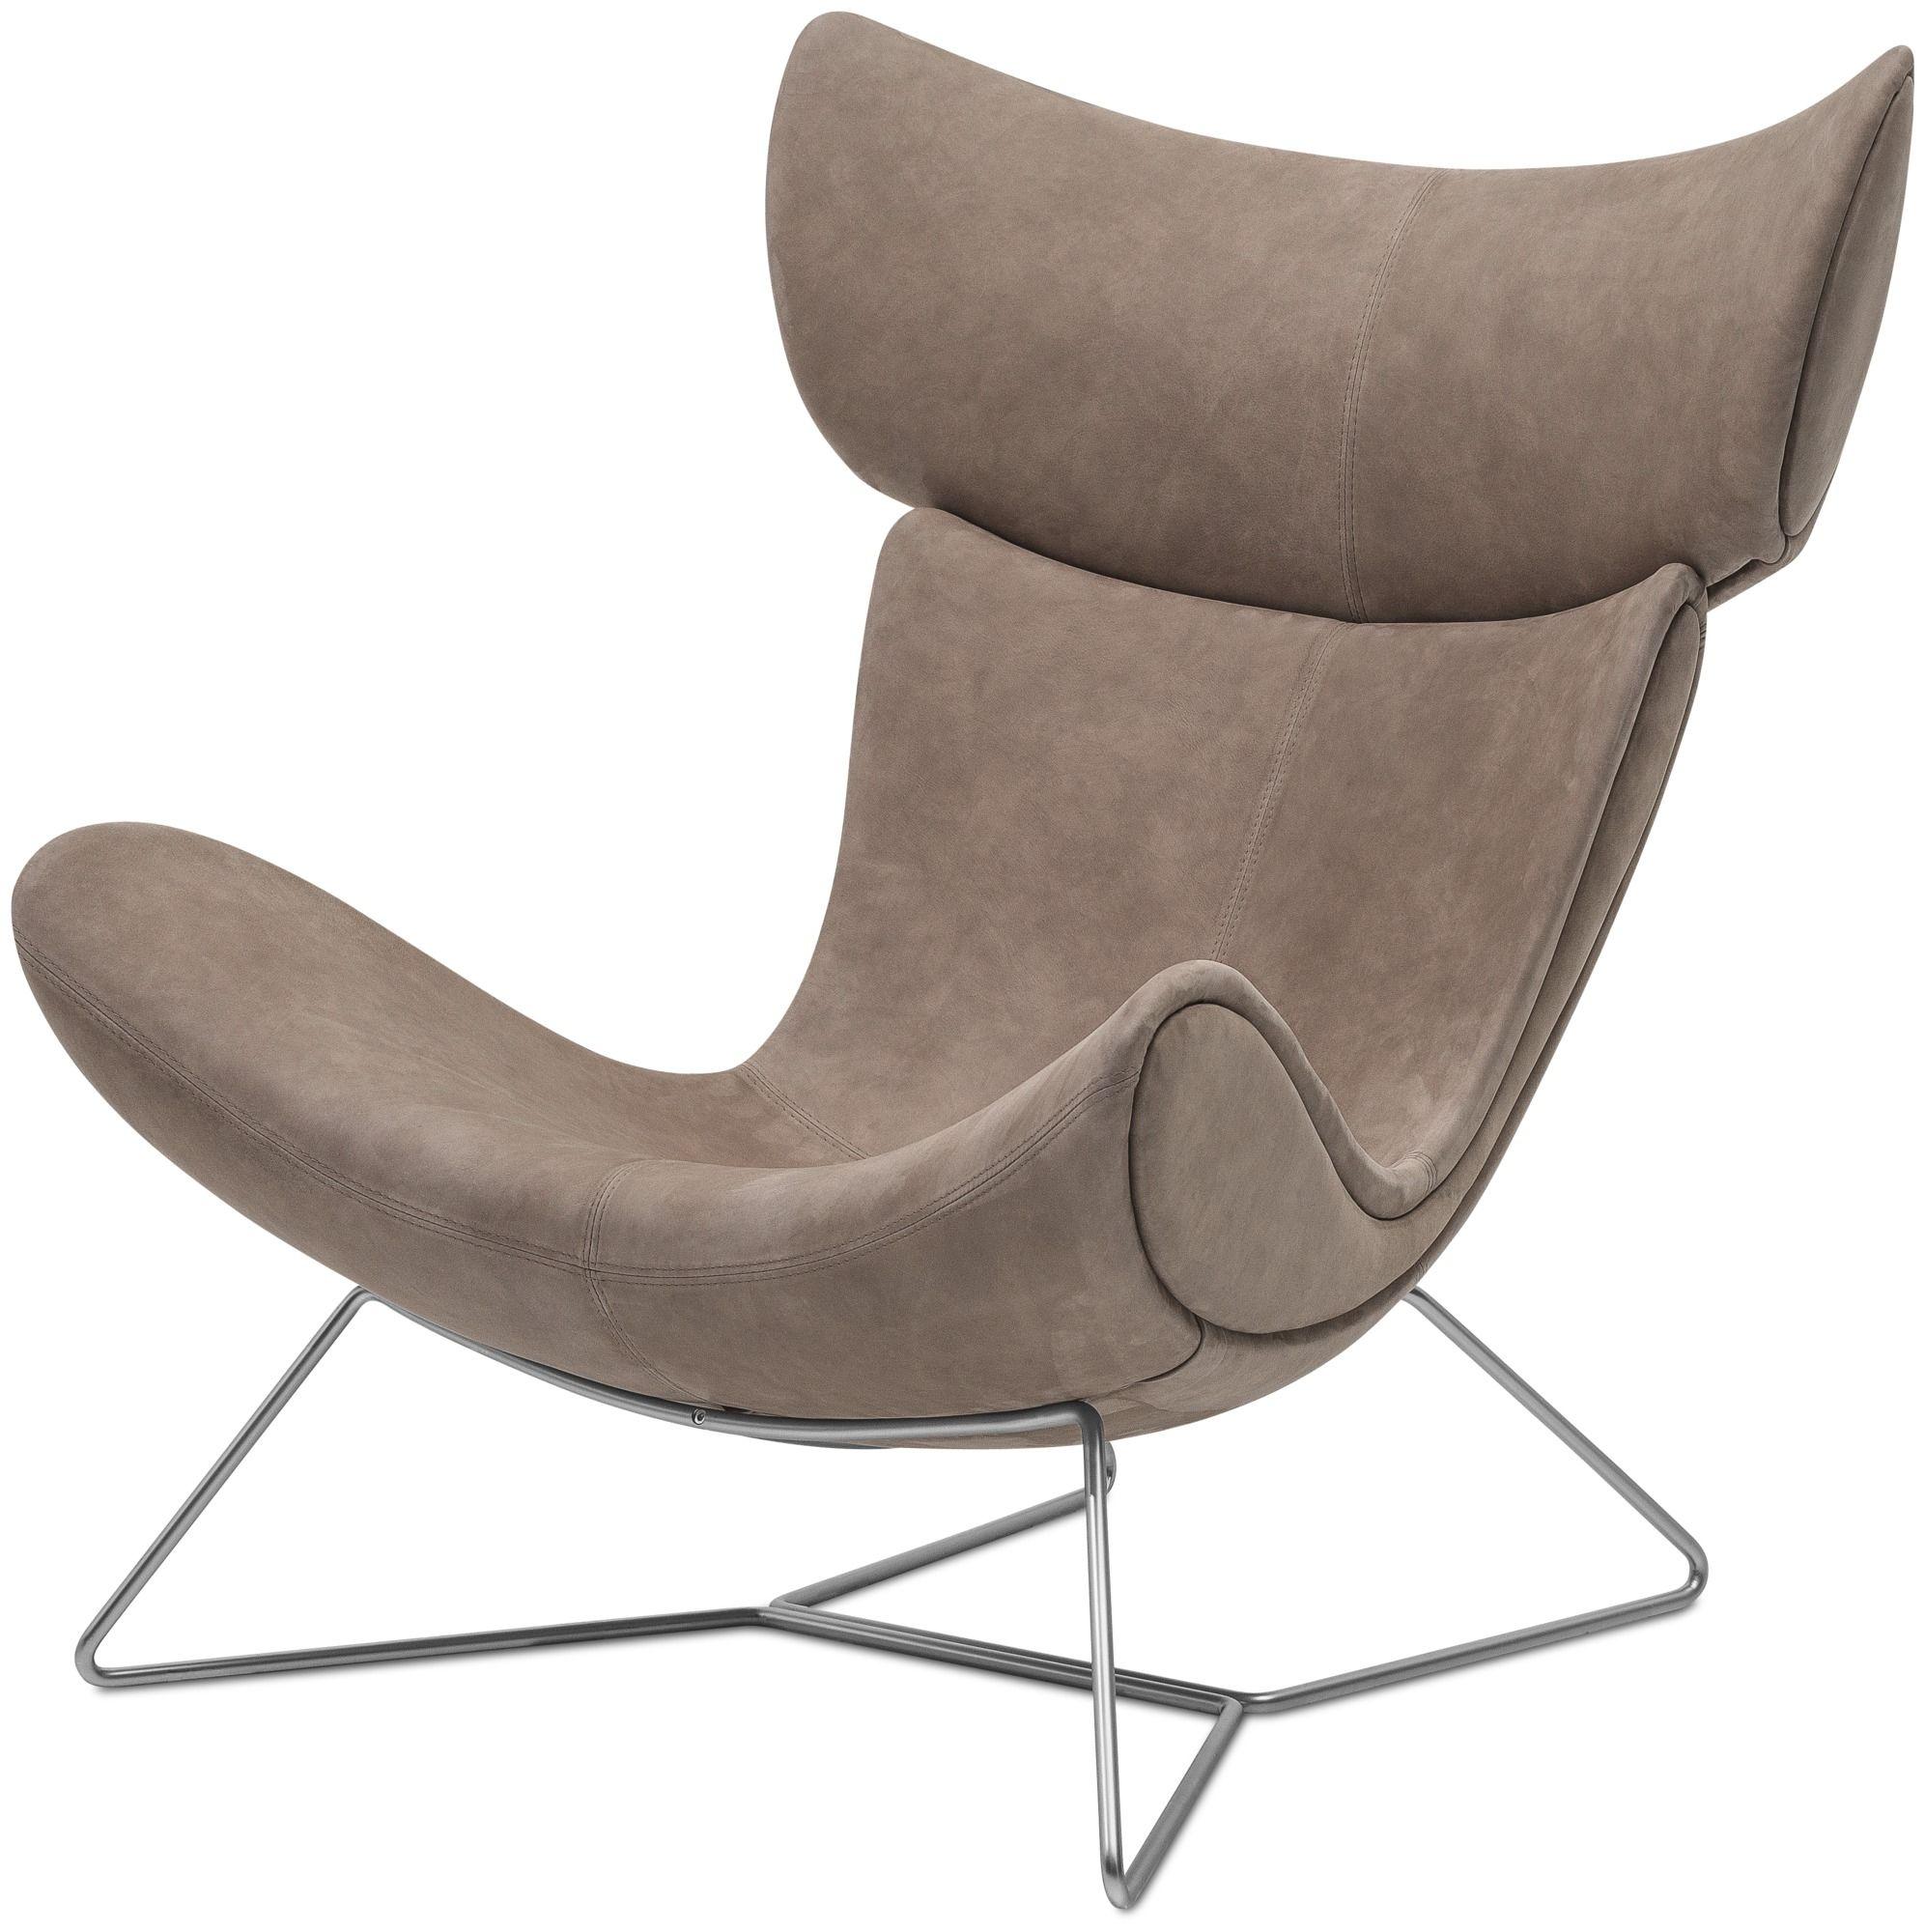 Fantastic Monaco Design Sofa By Boconcept In 2019 Comfortable Office Creativecarmelina Interior Chair Design Creativecarmelinacom